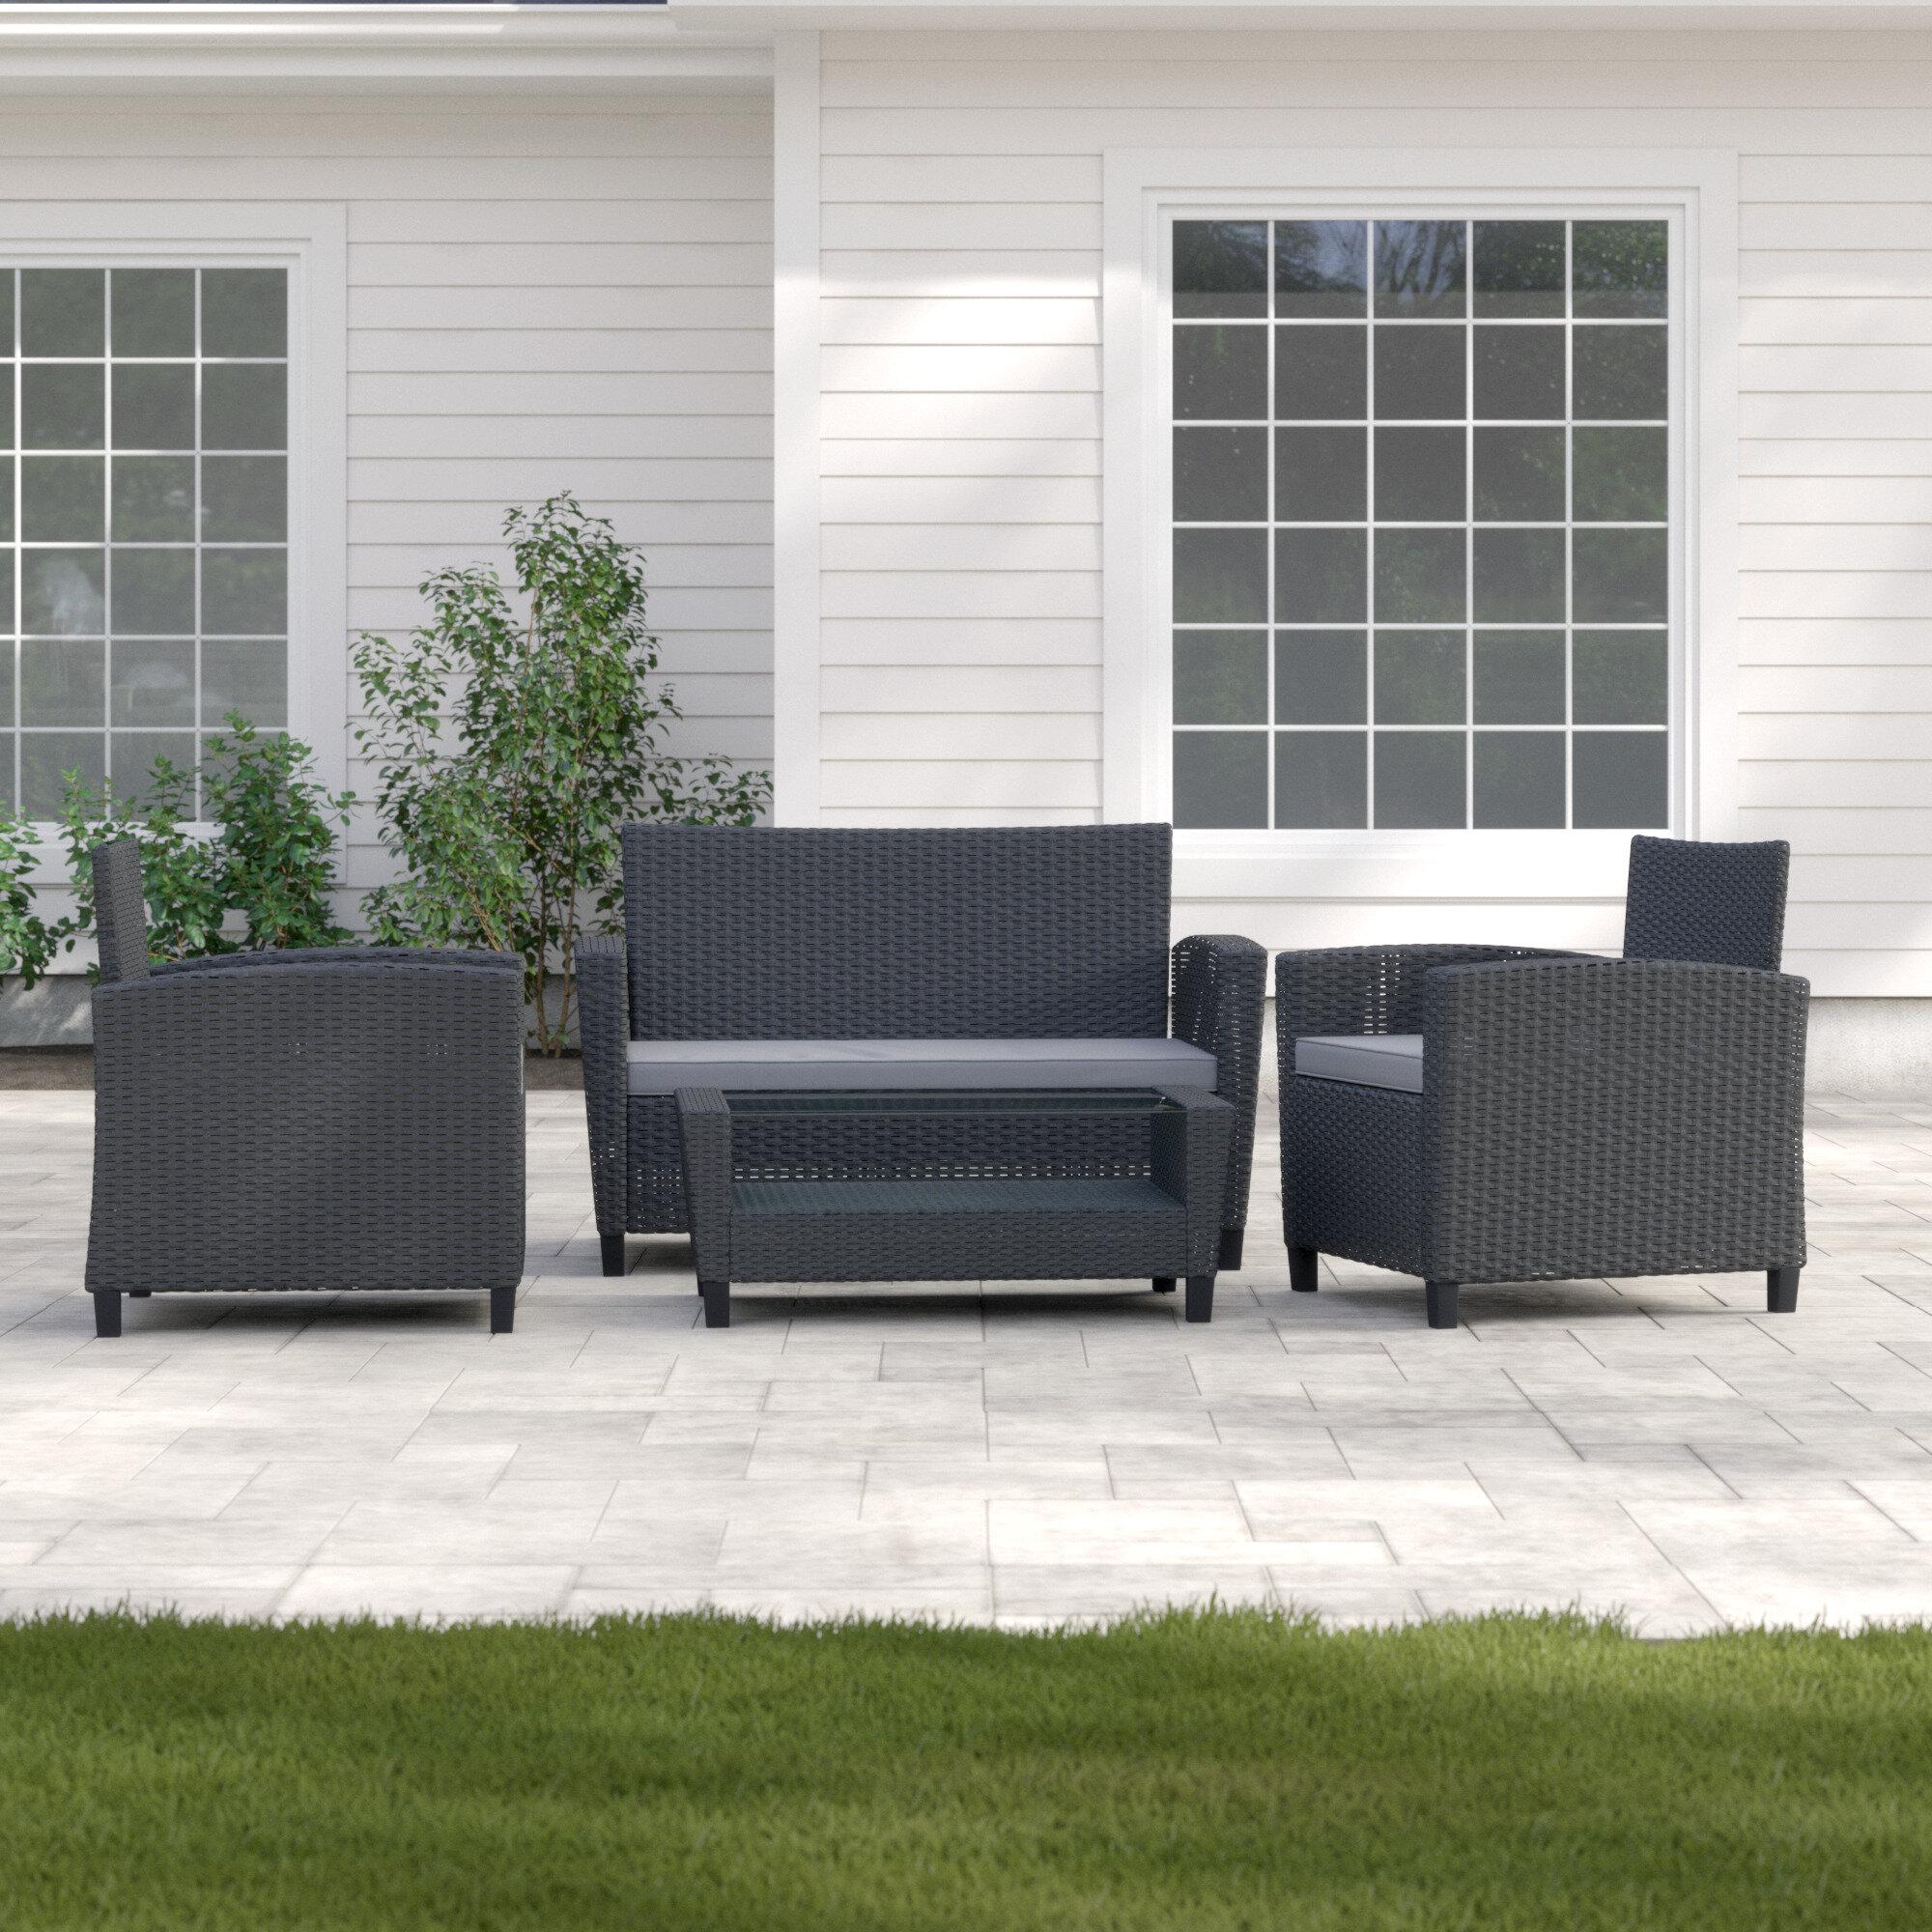 4 Piece Rattan Sofa Seating Group